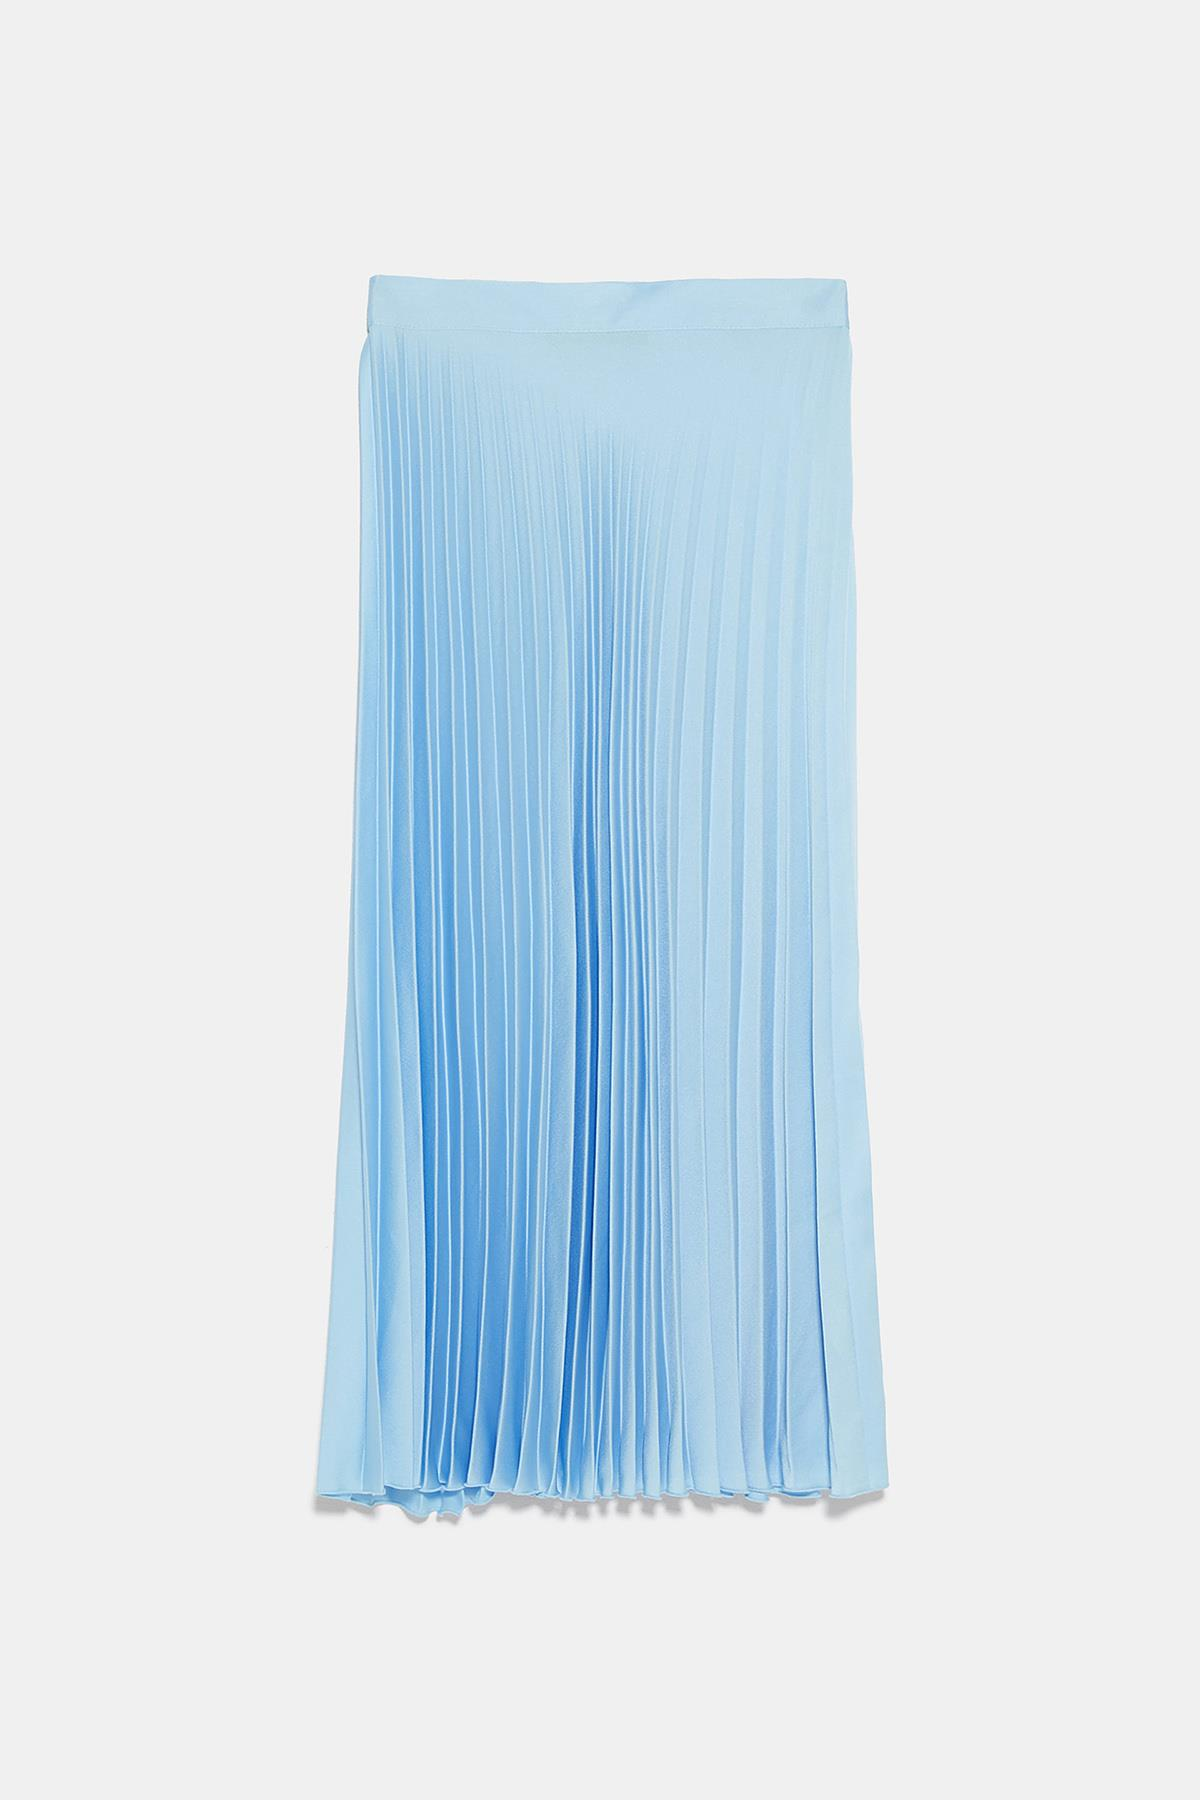 27a585da6 zara-falda-plisada-celeste. Falda plisada azul pastel